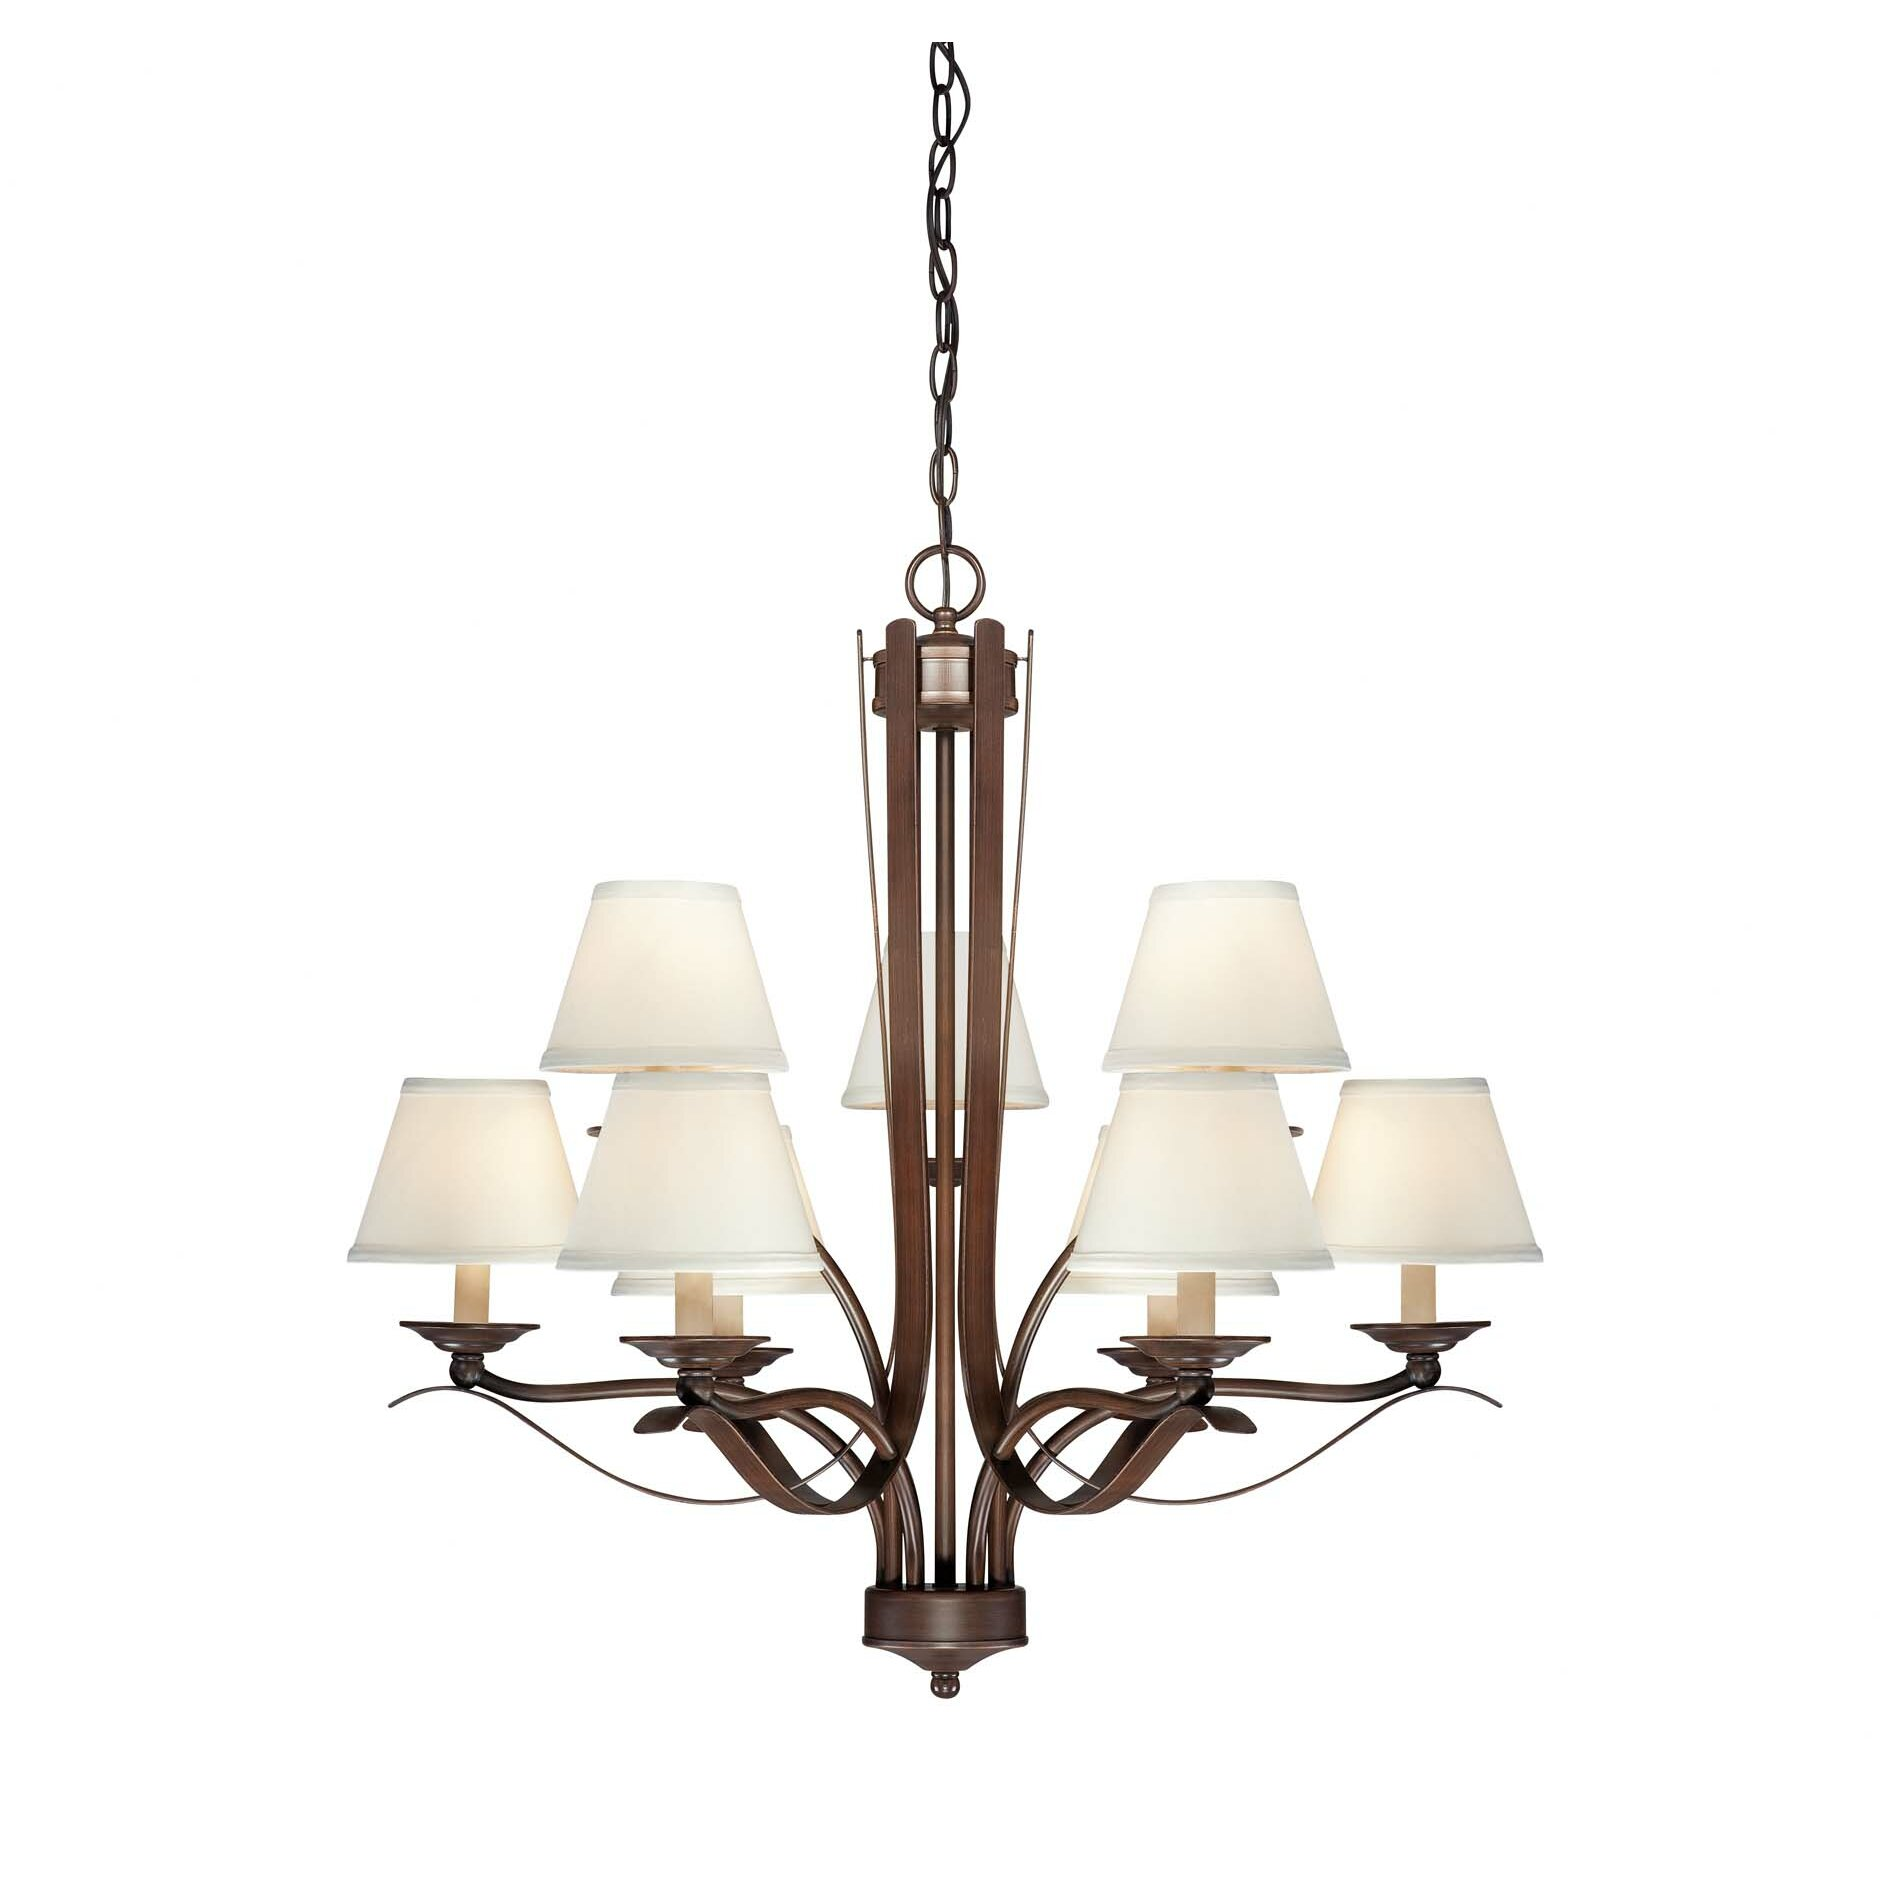 Savoy house maremma 9 light chandelier wayfair for Savoy house